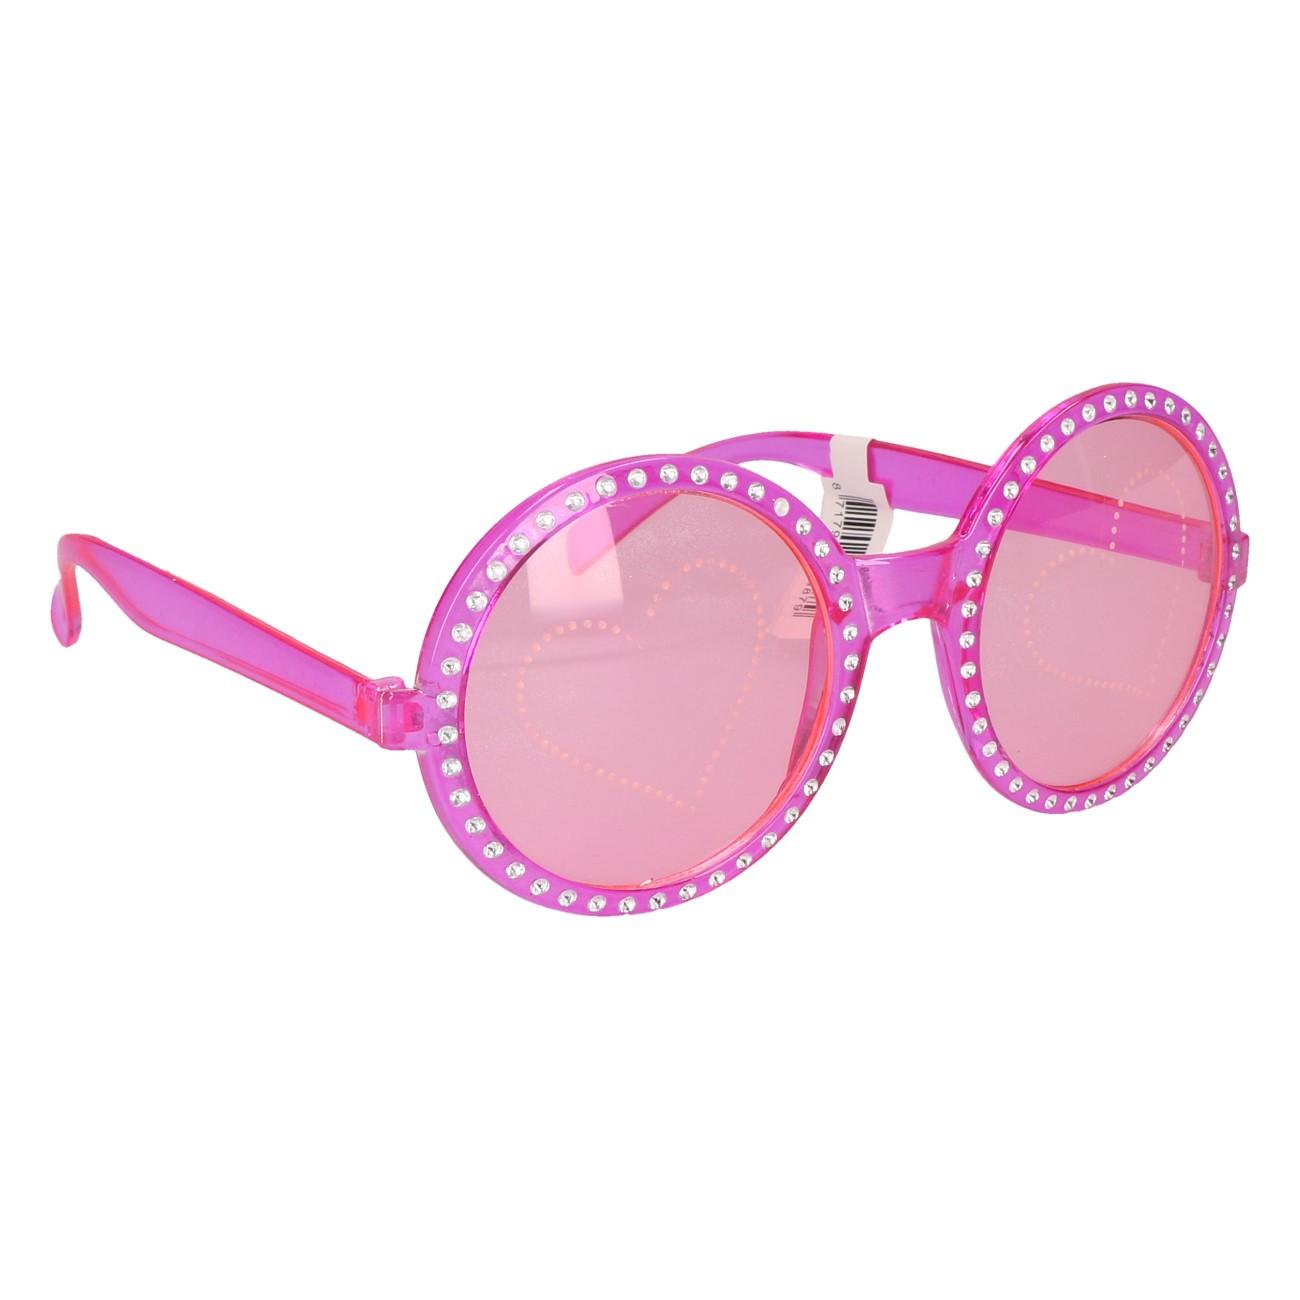 Partybril roze met bling/hart